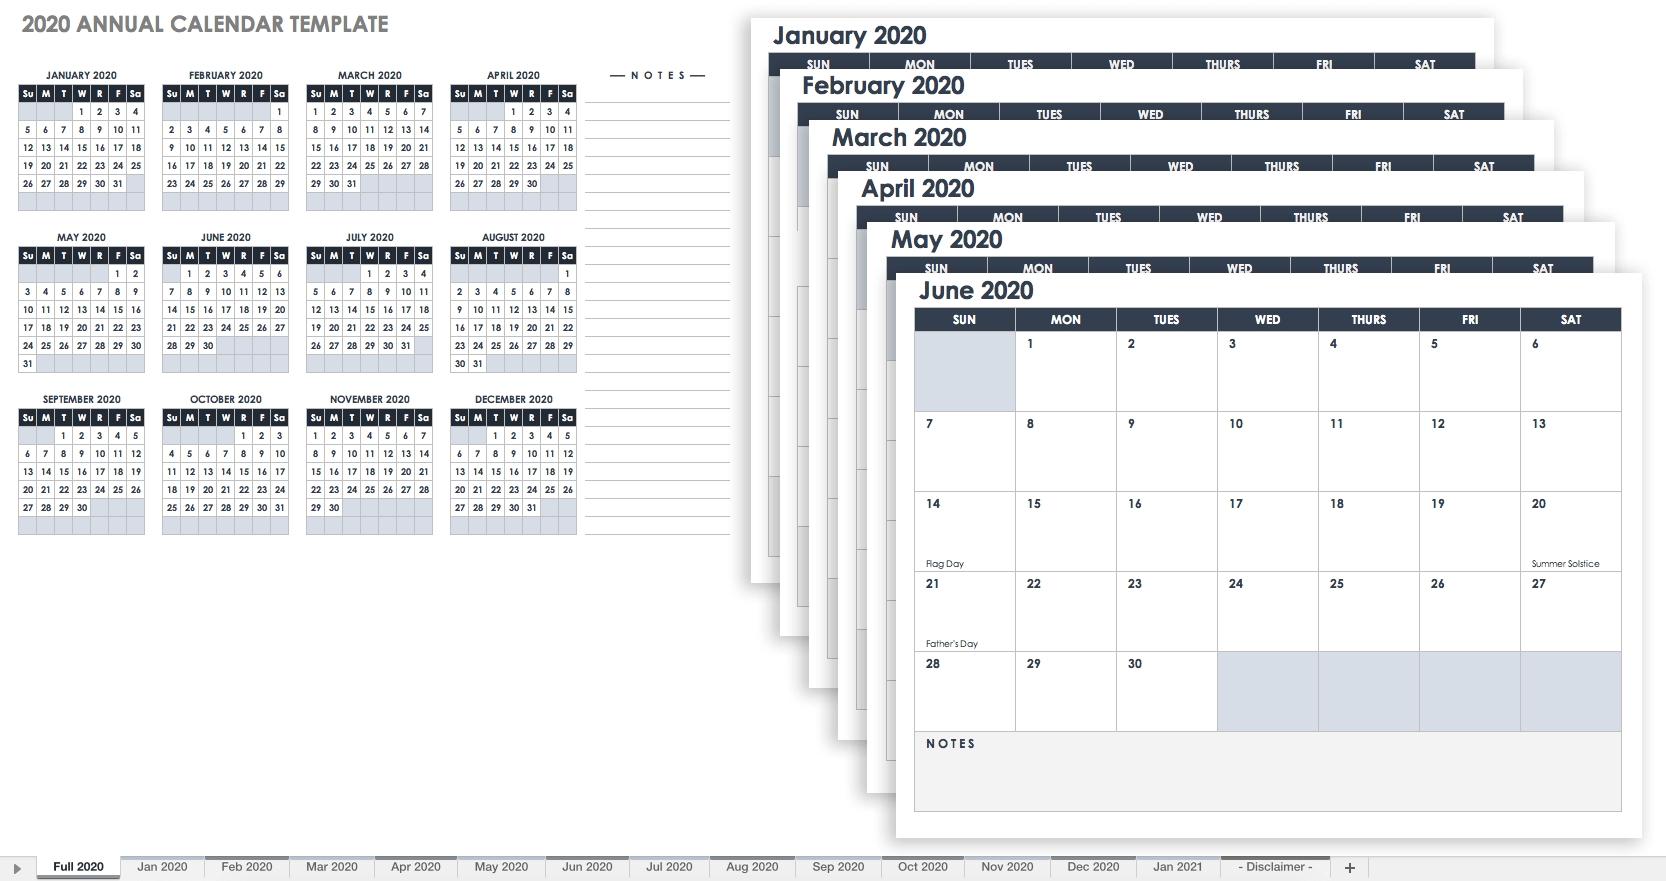 28 Free Time Management Worksheets | Smartsheet pertaining to Blank Weekly Hourly Calendar 8-10